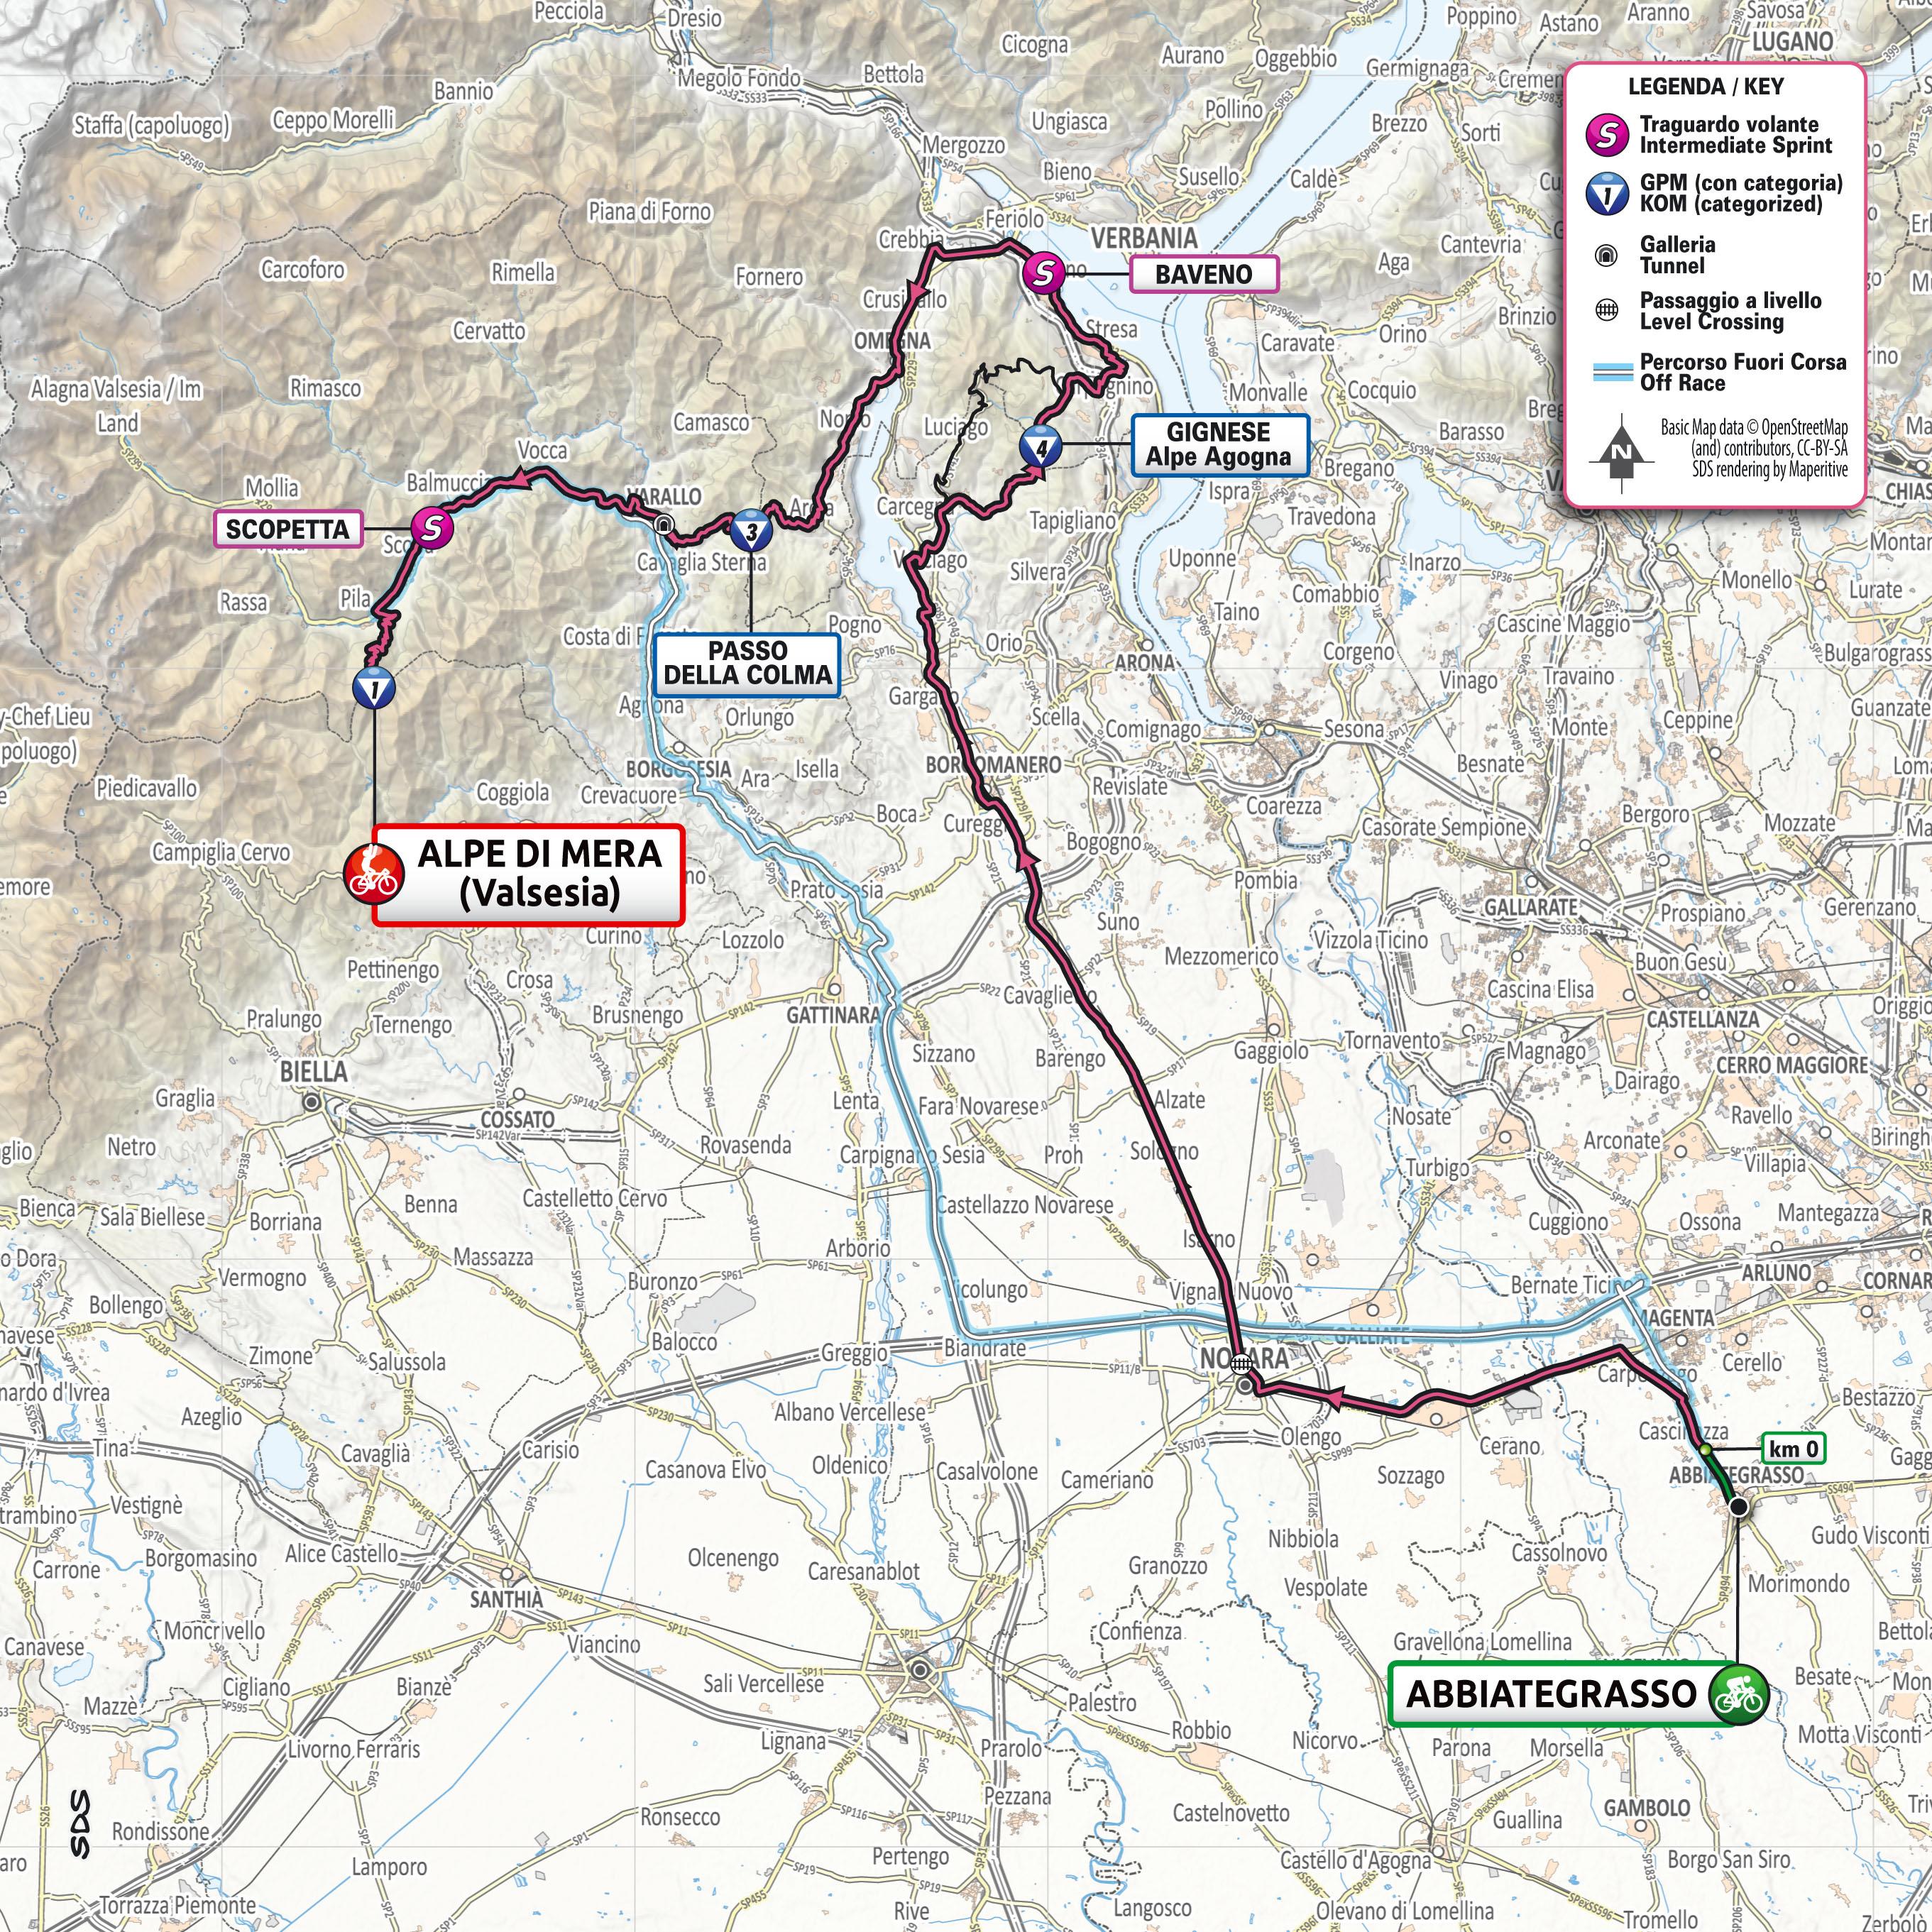 Planimetria Etapa 19 Giro d'Italia 2021: Abbiategrasso, Alpe di Mera (Valsesia)